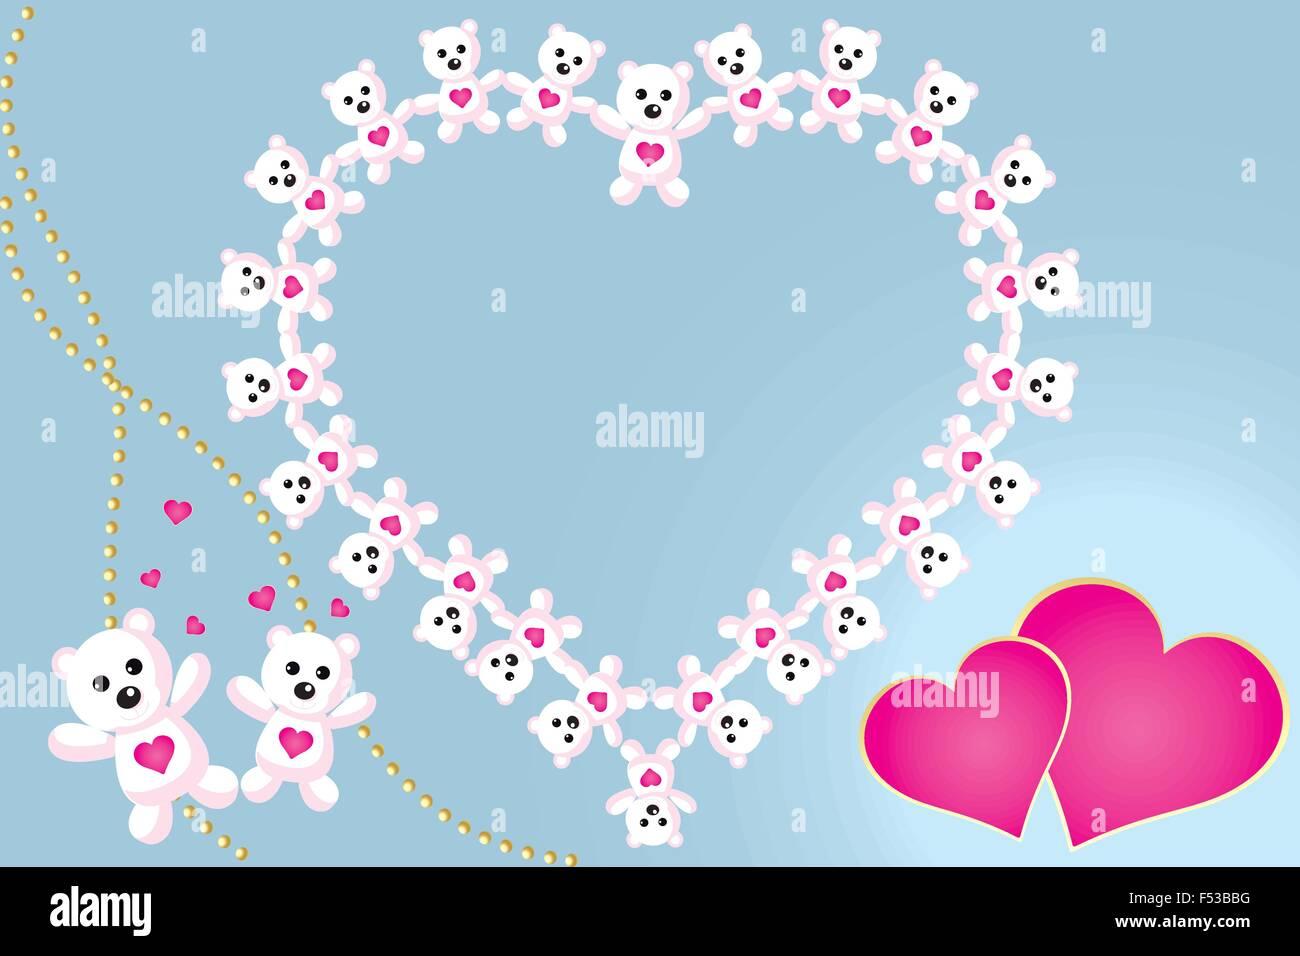 Pink Teddies Stock Photos & Pink Teddies Stock Images - Alamy